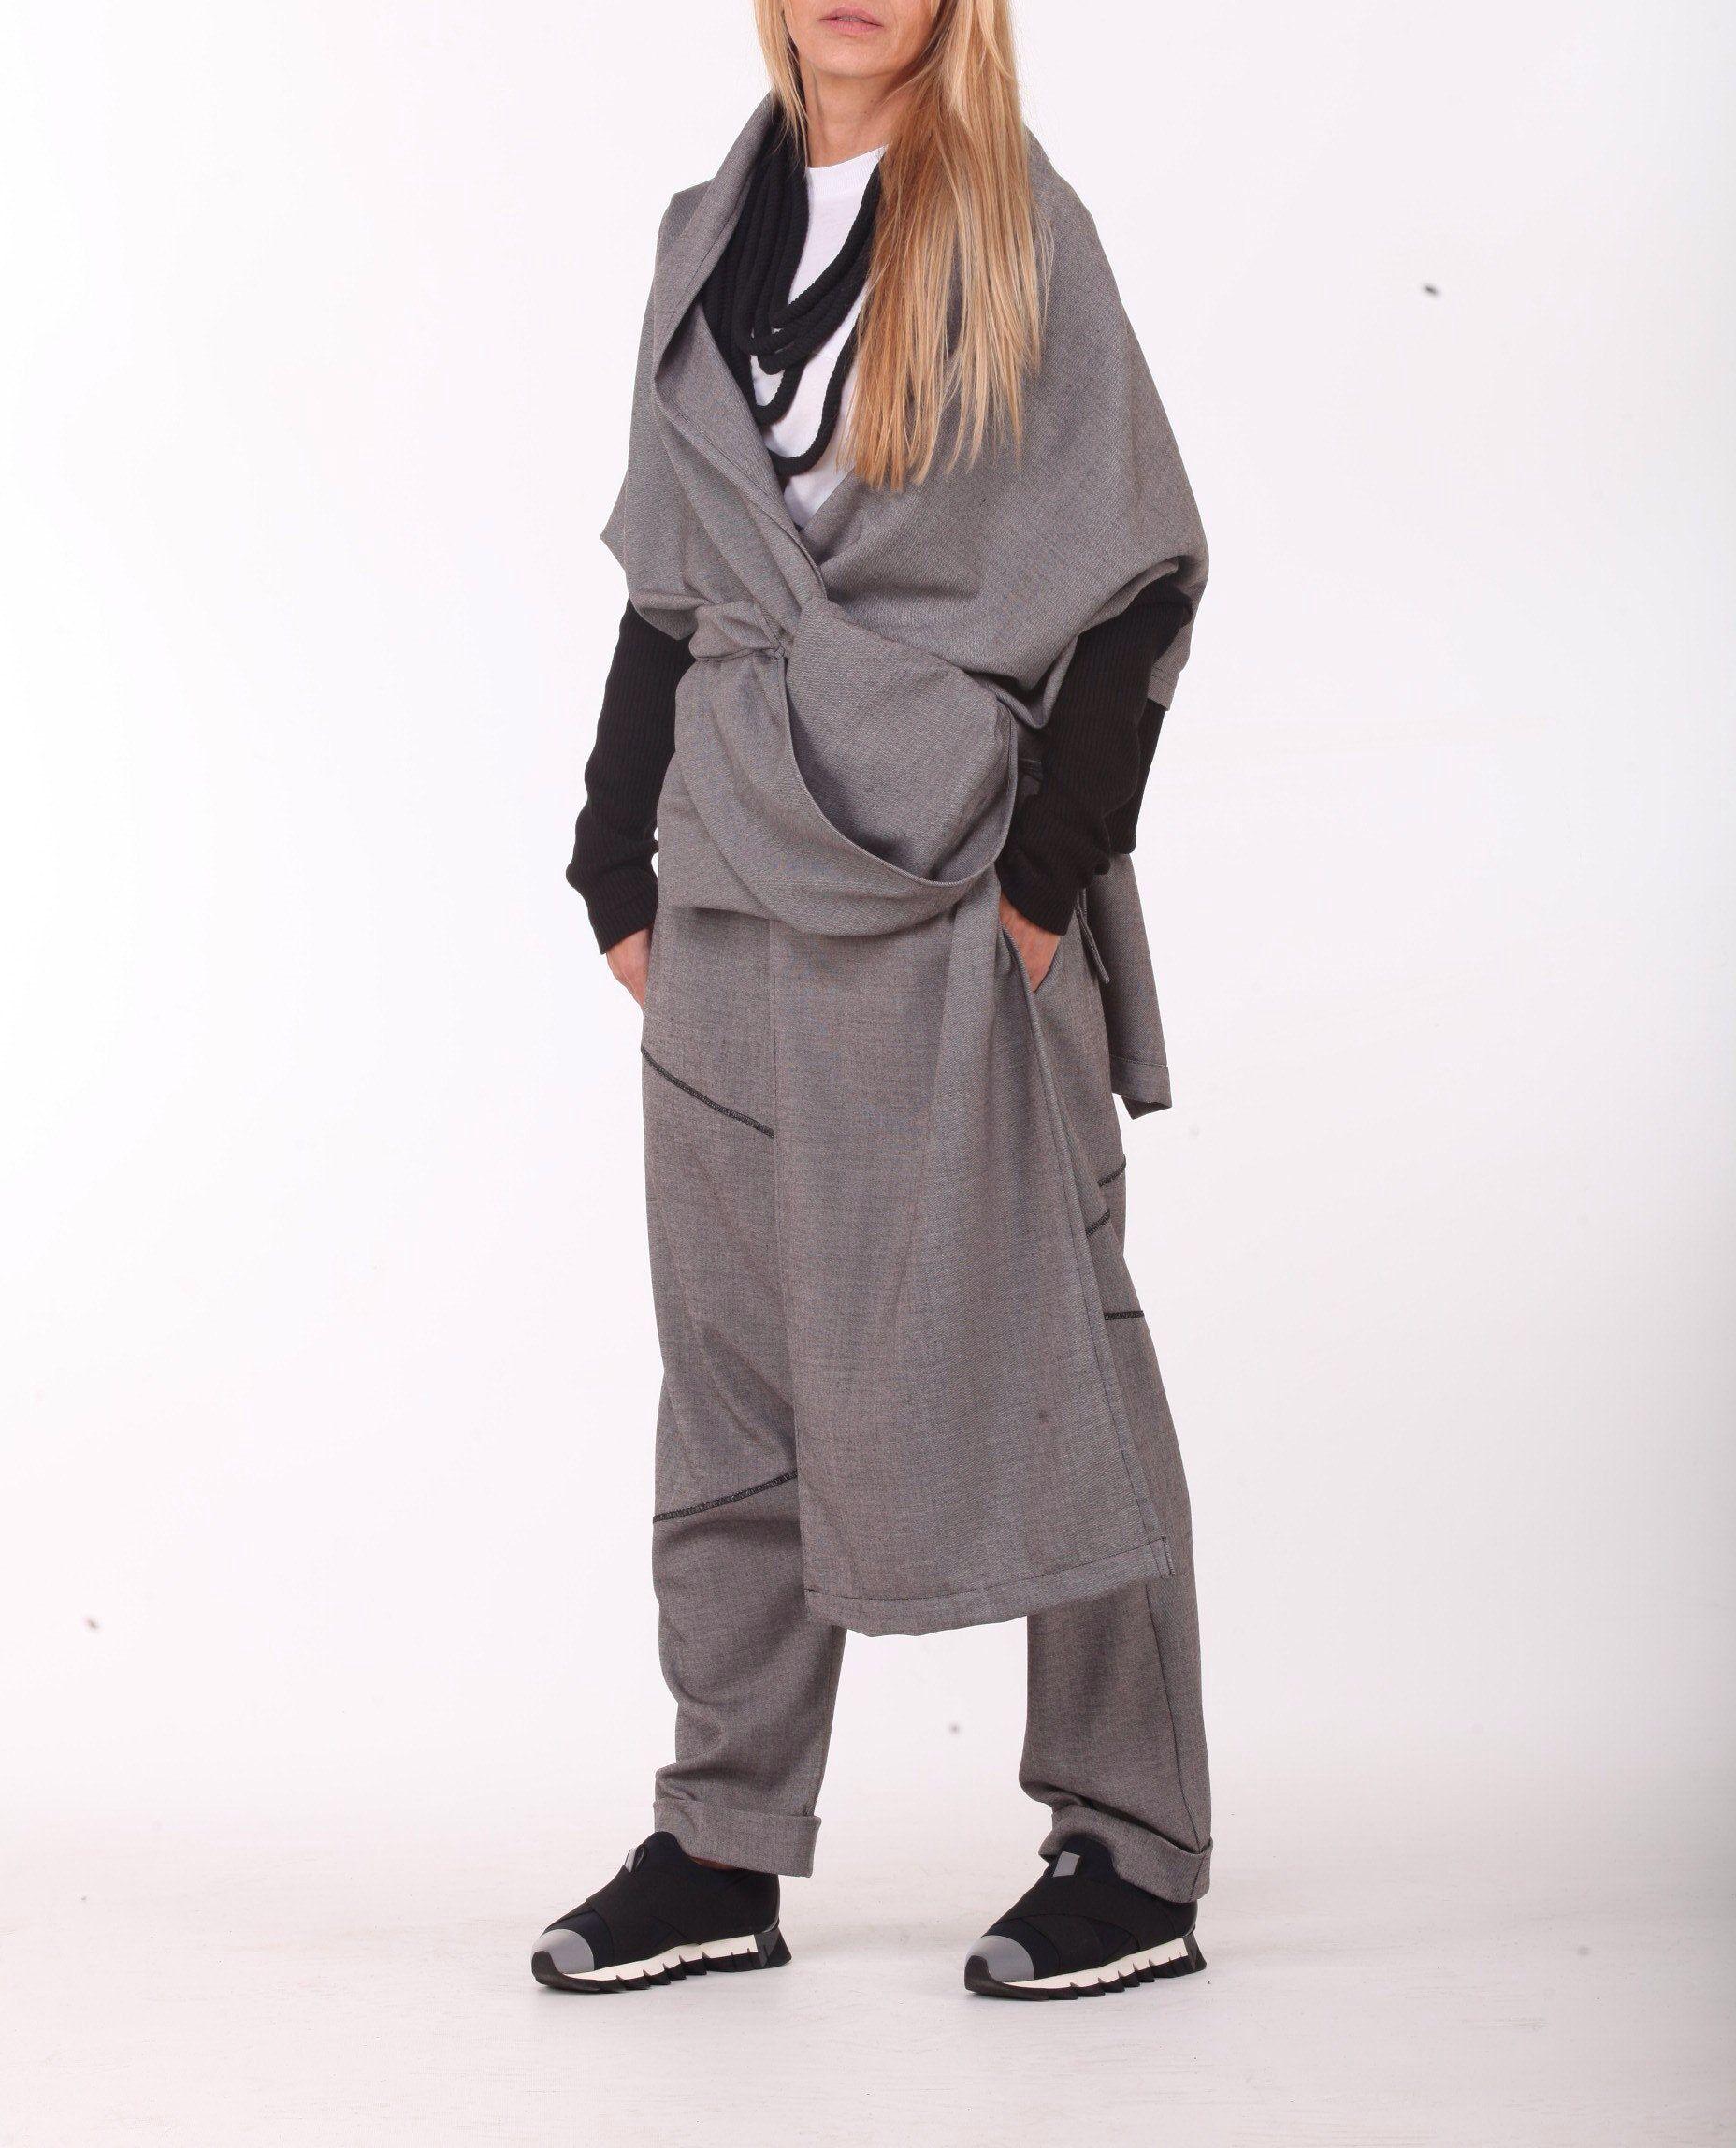 Long Sleeve Shirt /& Pants ConceptBG Fashion Costume Designer Sports Set Asymmetric Shirt Harem Pants